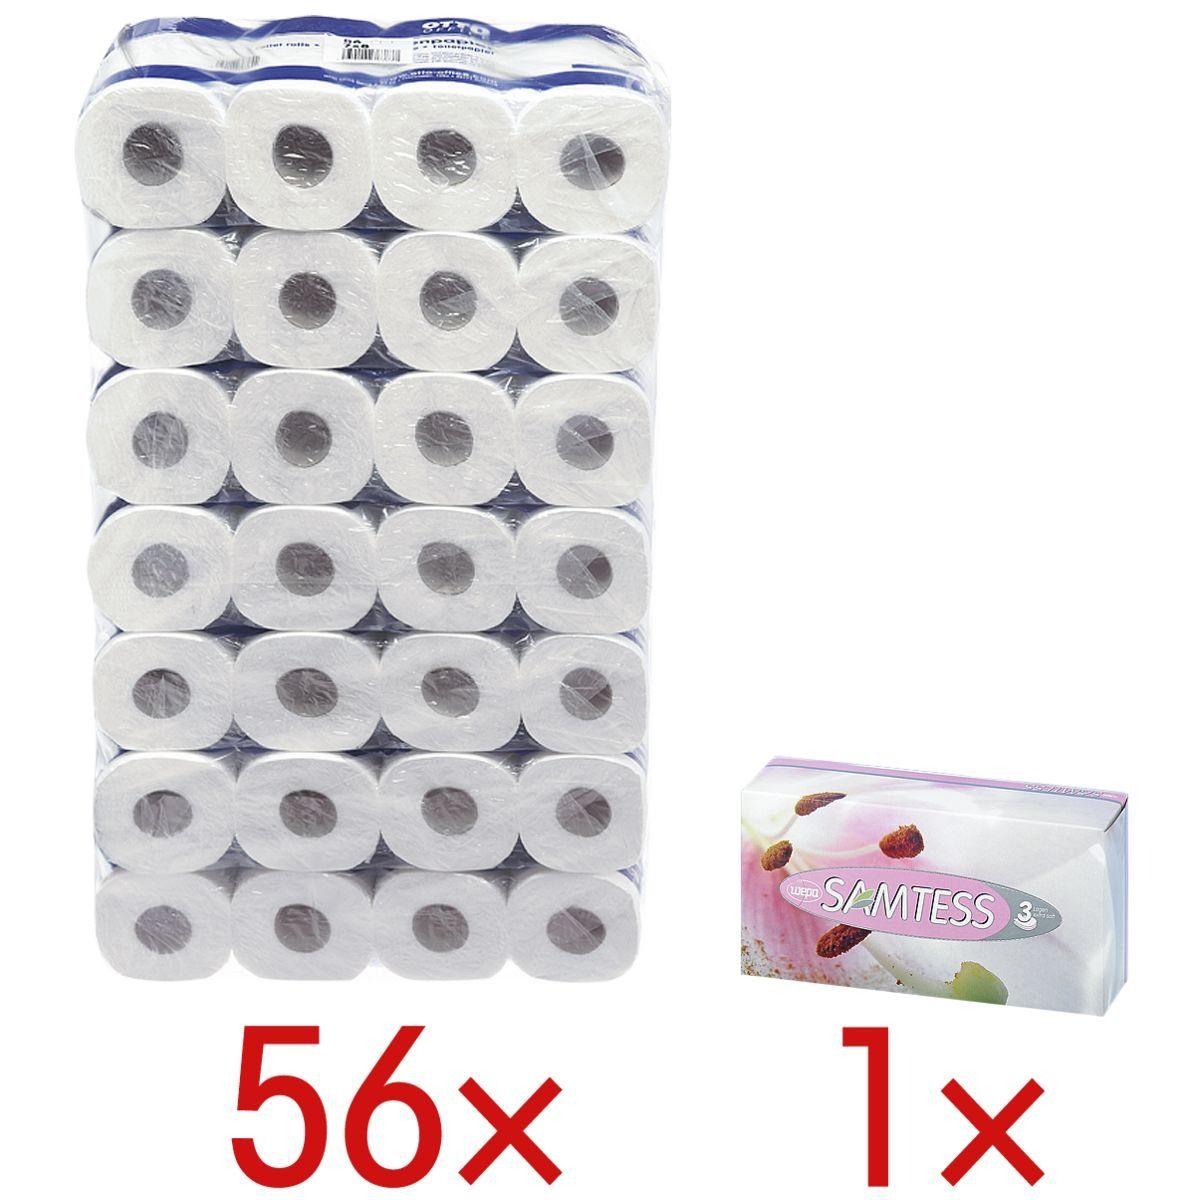 OTTO Office Standard Toilettenpapier inkl. Kosmetiktücher 1 Set